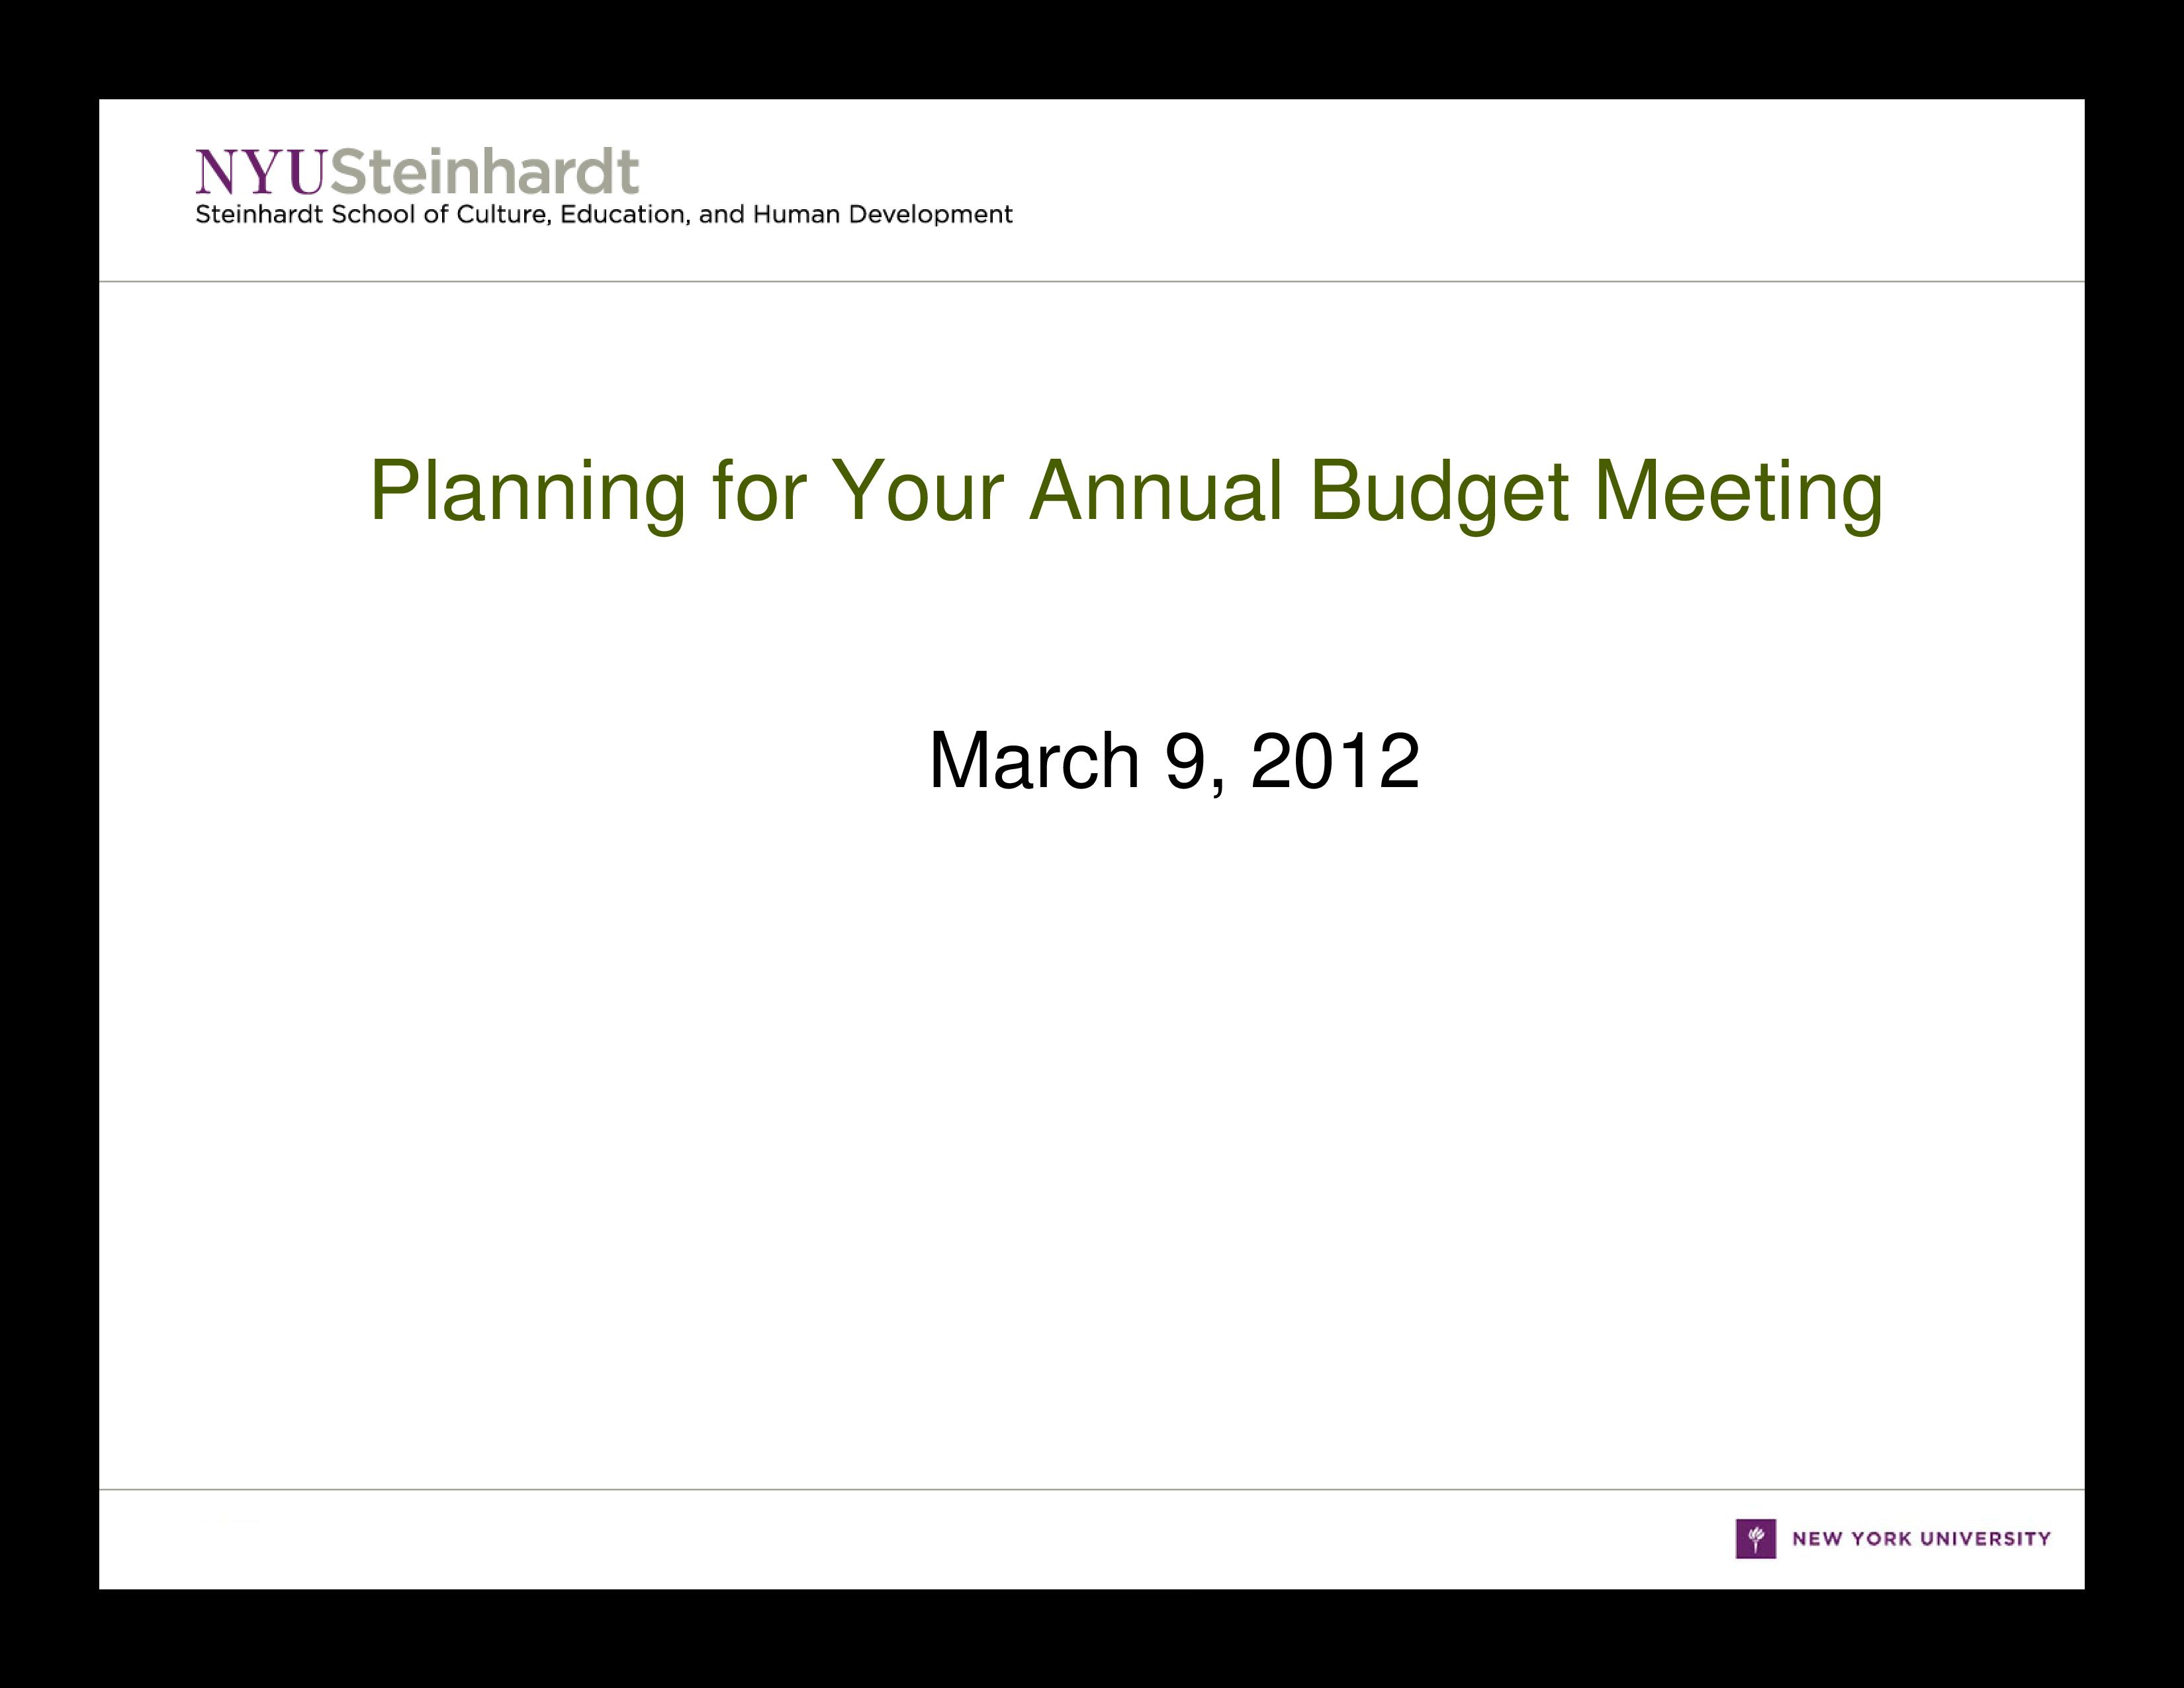 free budget planning meeting agenda templates at